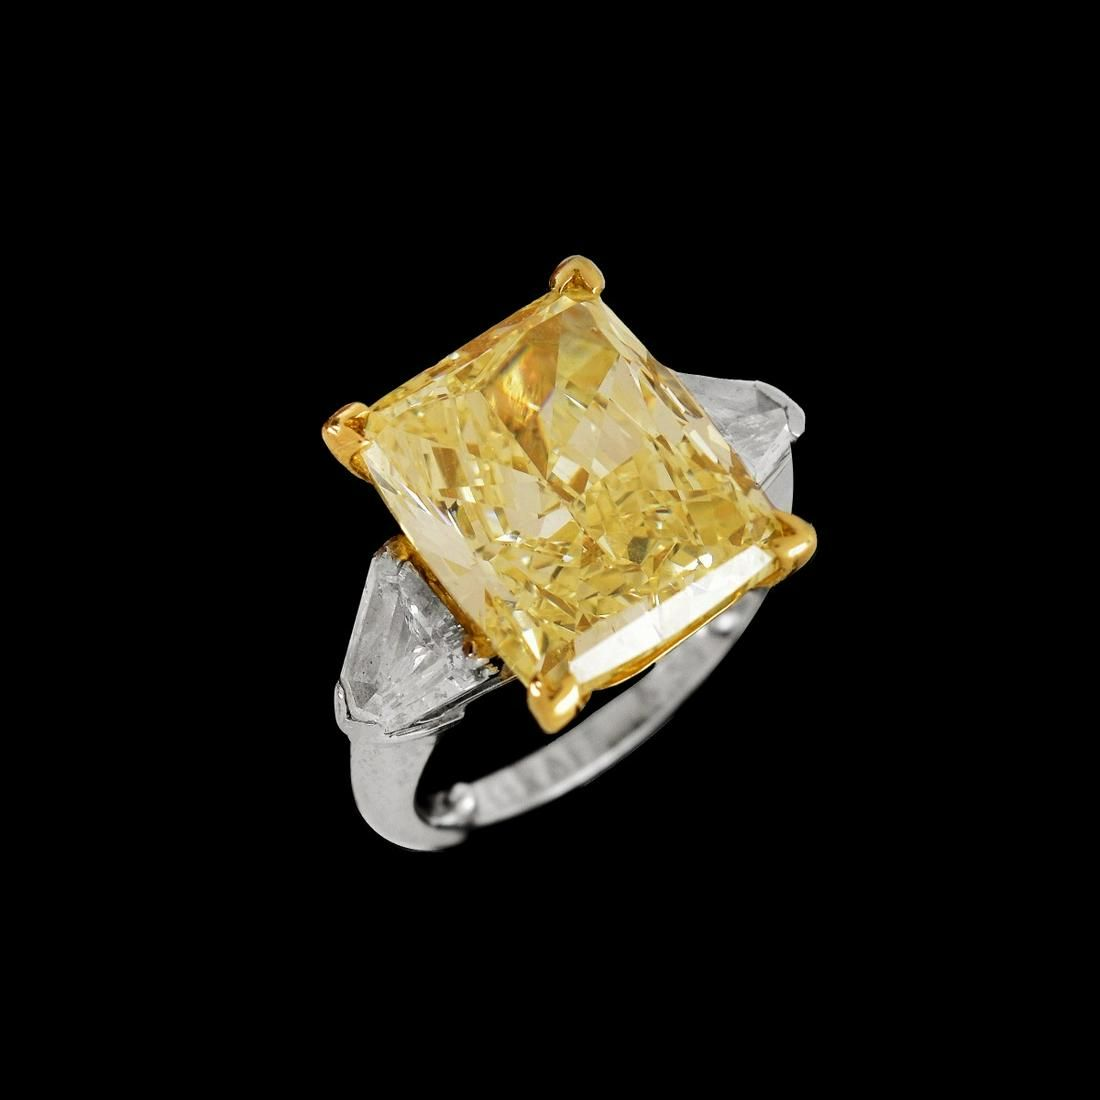 Graff 8.56ct Fancy Yellow Diamond Ring